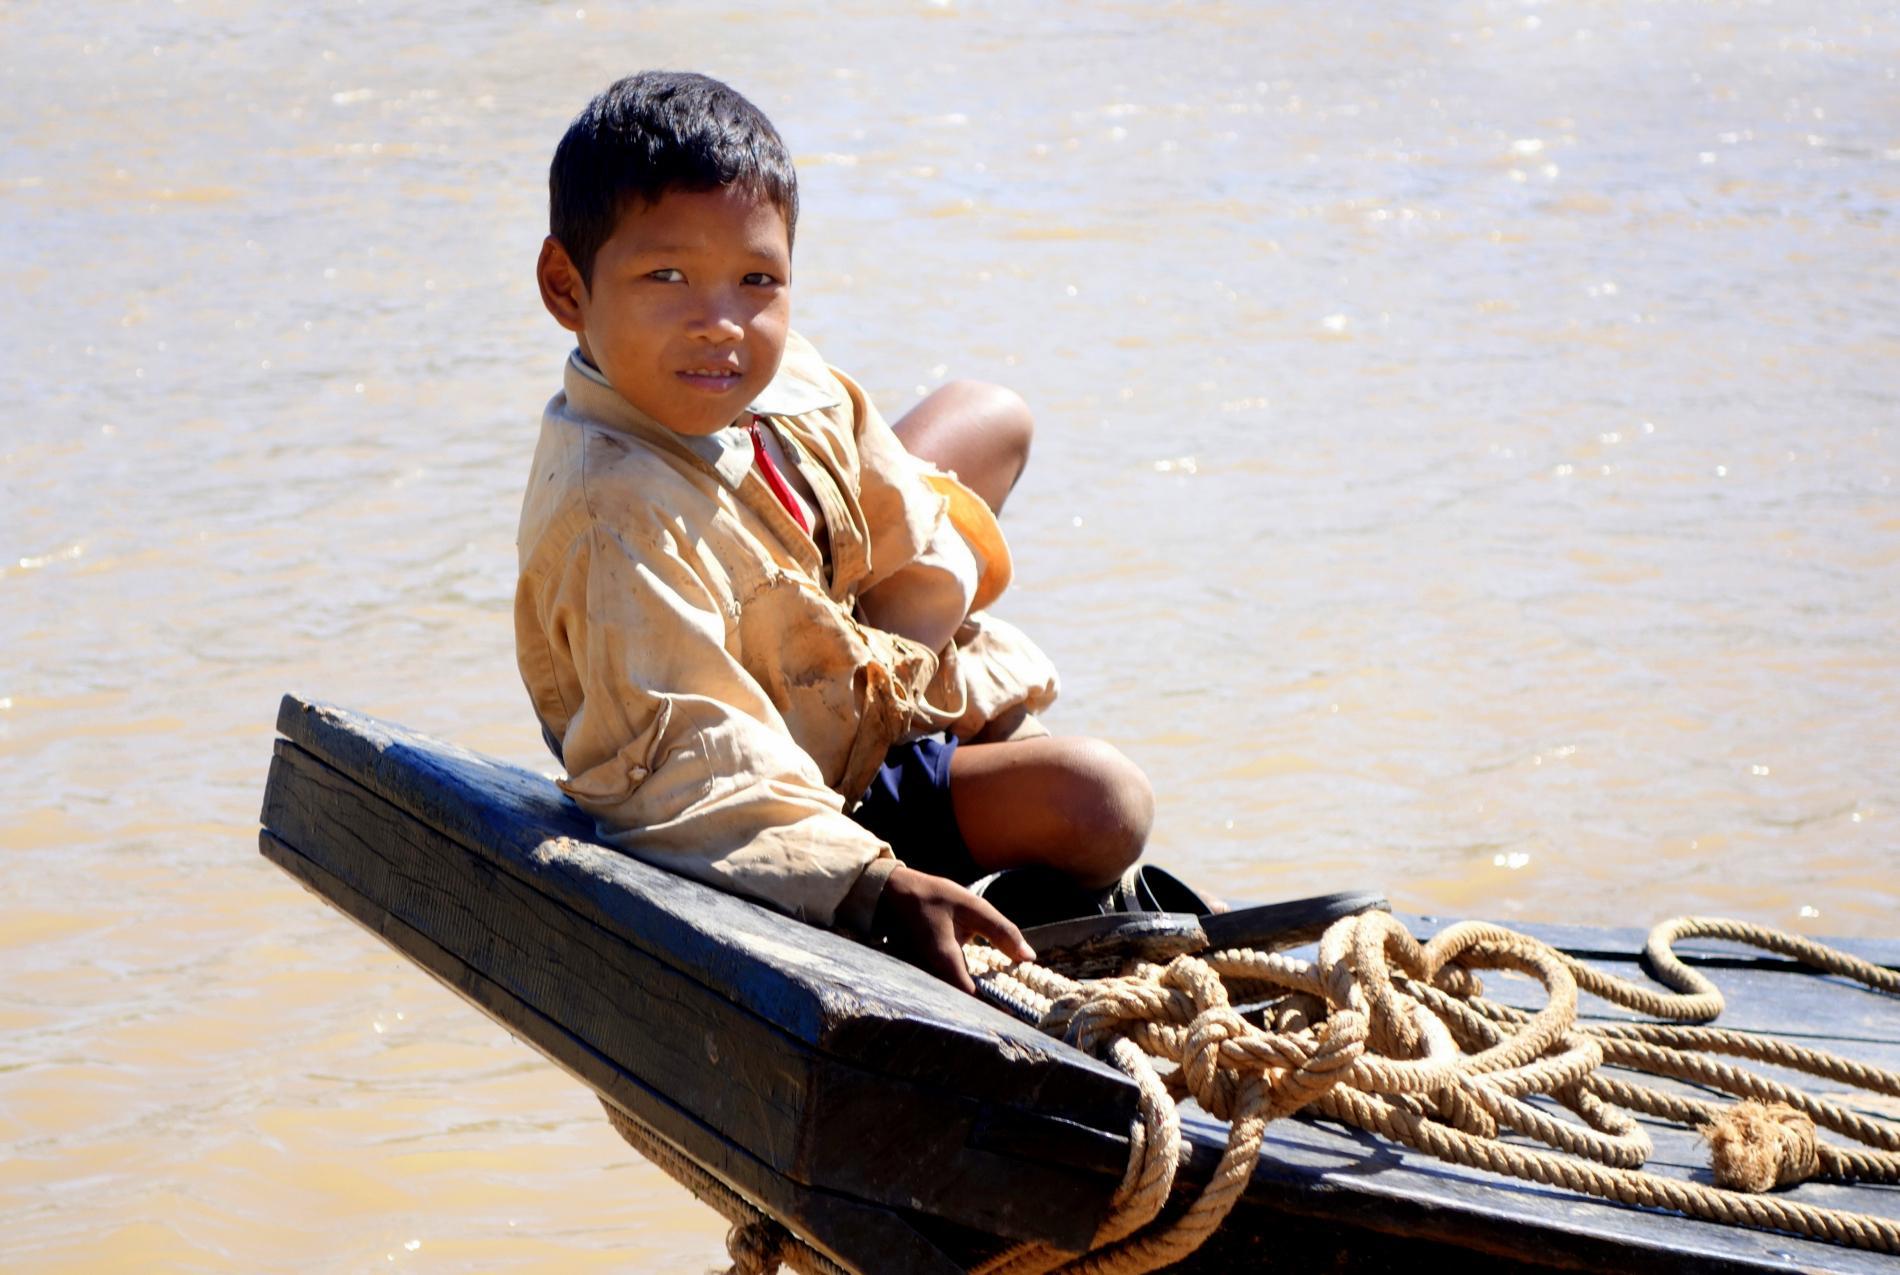 Voyage solidaire Vietnam-Cambodge : Vision du Monde - Photo 10